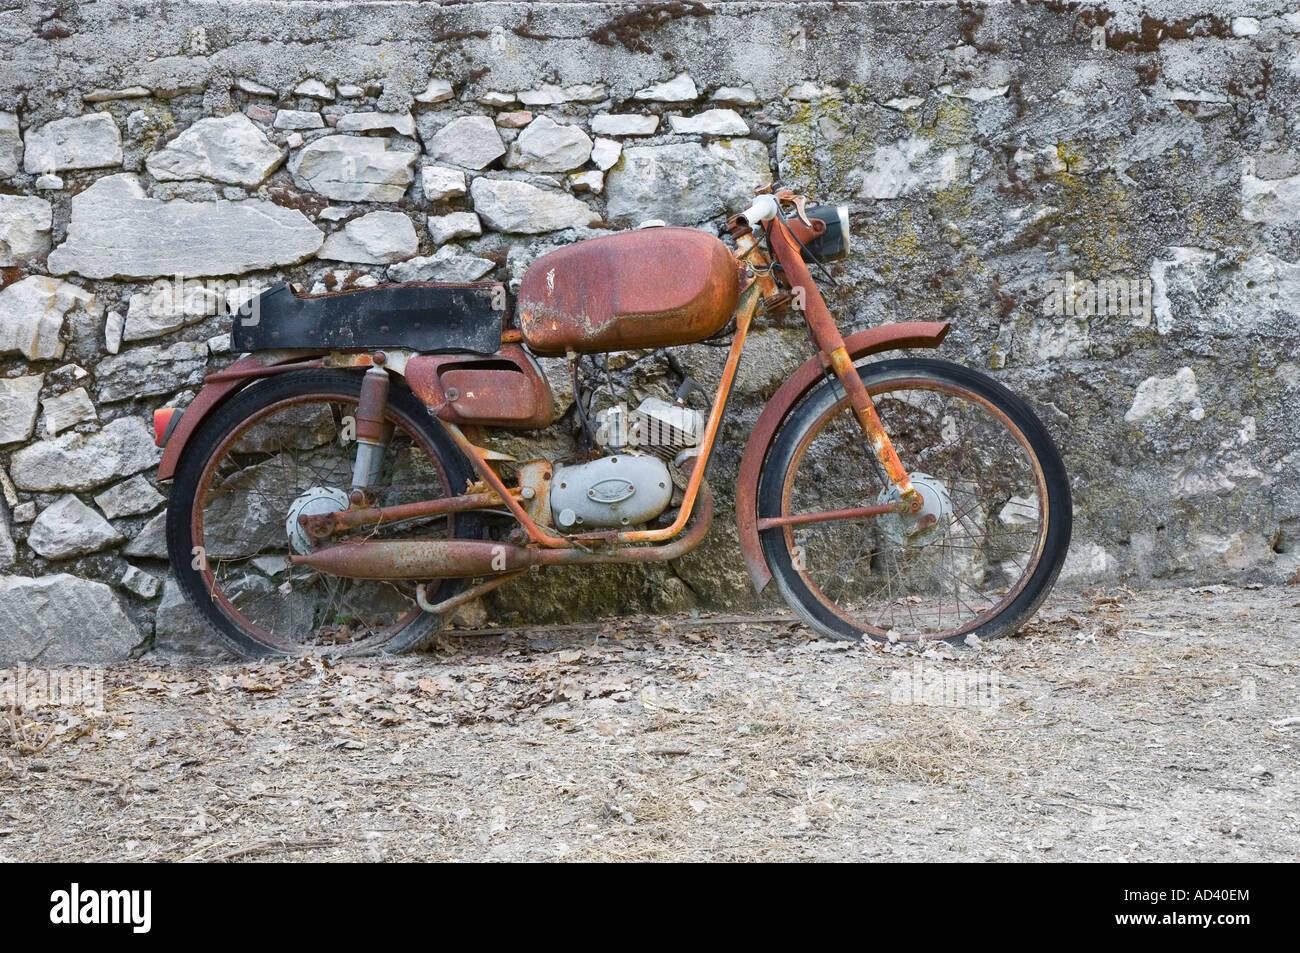 Malanca motori morini franco motorbike leaning against for Sell em all motors